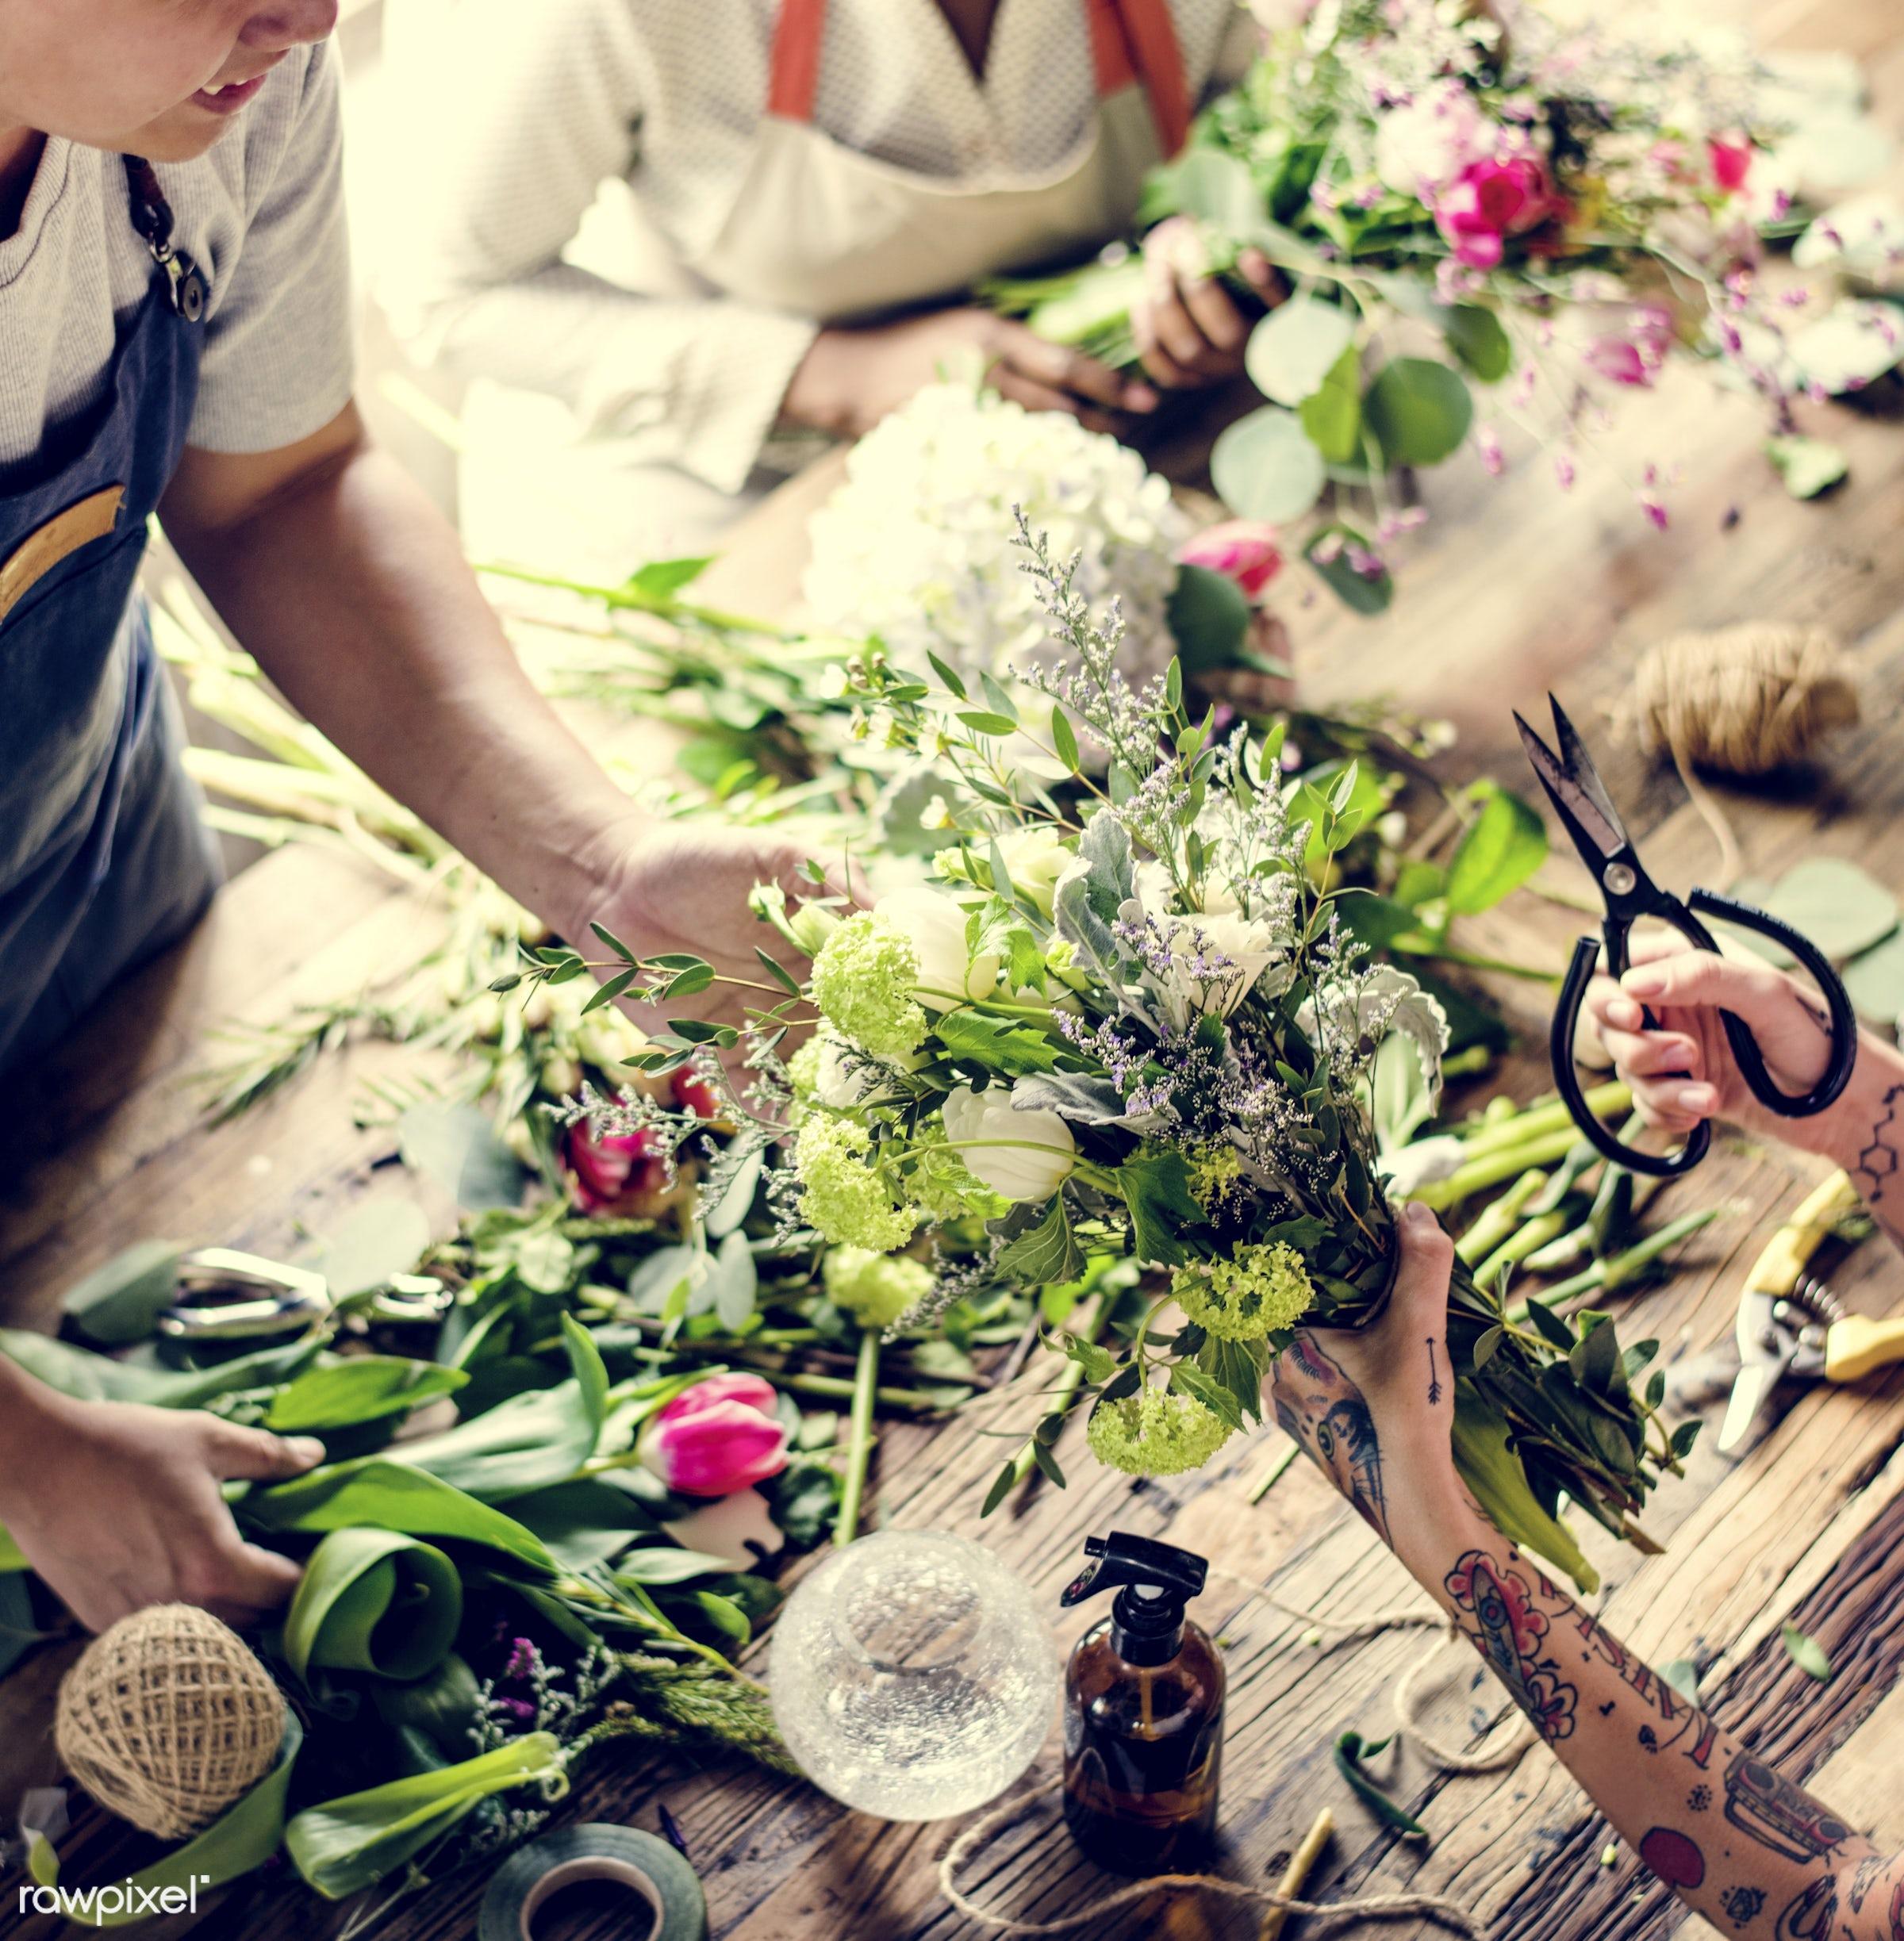 bouquet, shop, detail, person, hydrangea, people, decor, nature, woman, tattoo, flowers, work, refreshment, florist, present...